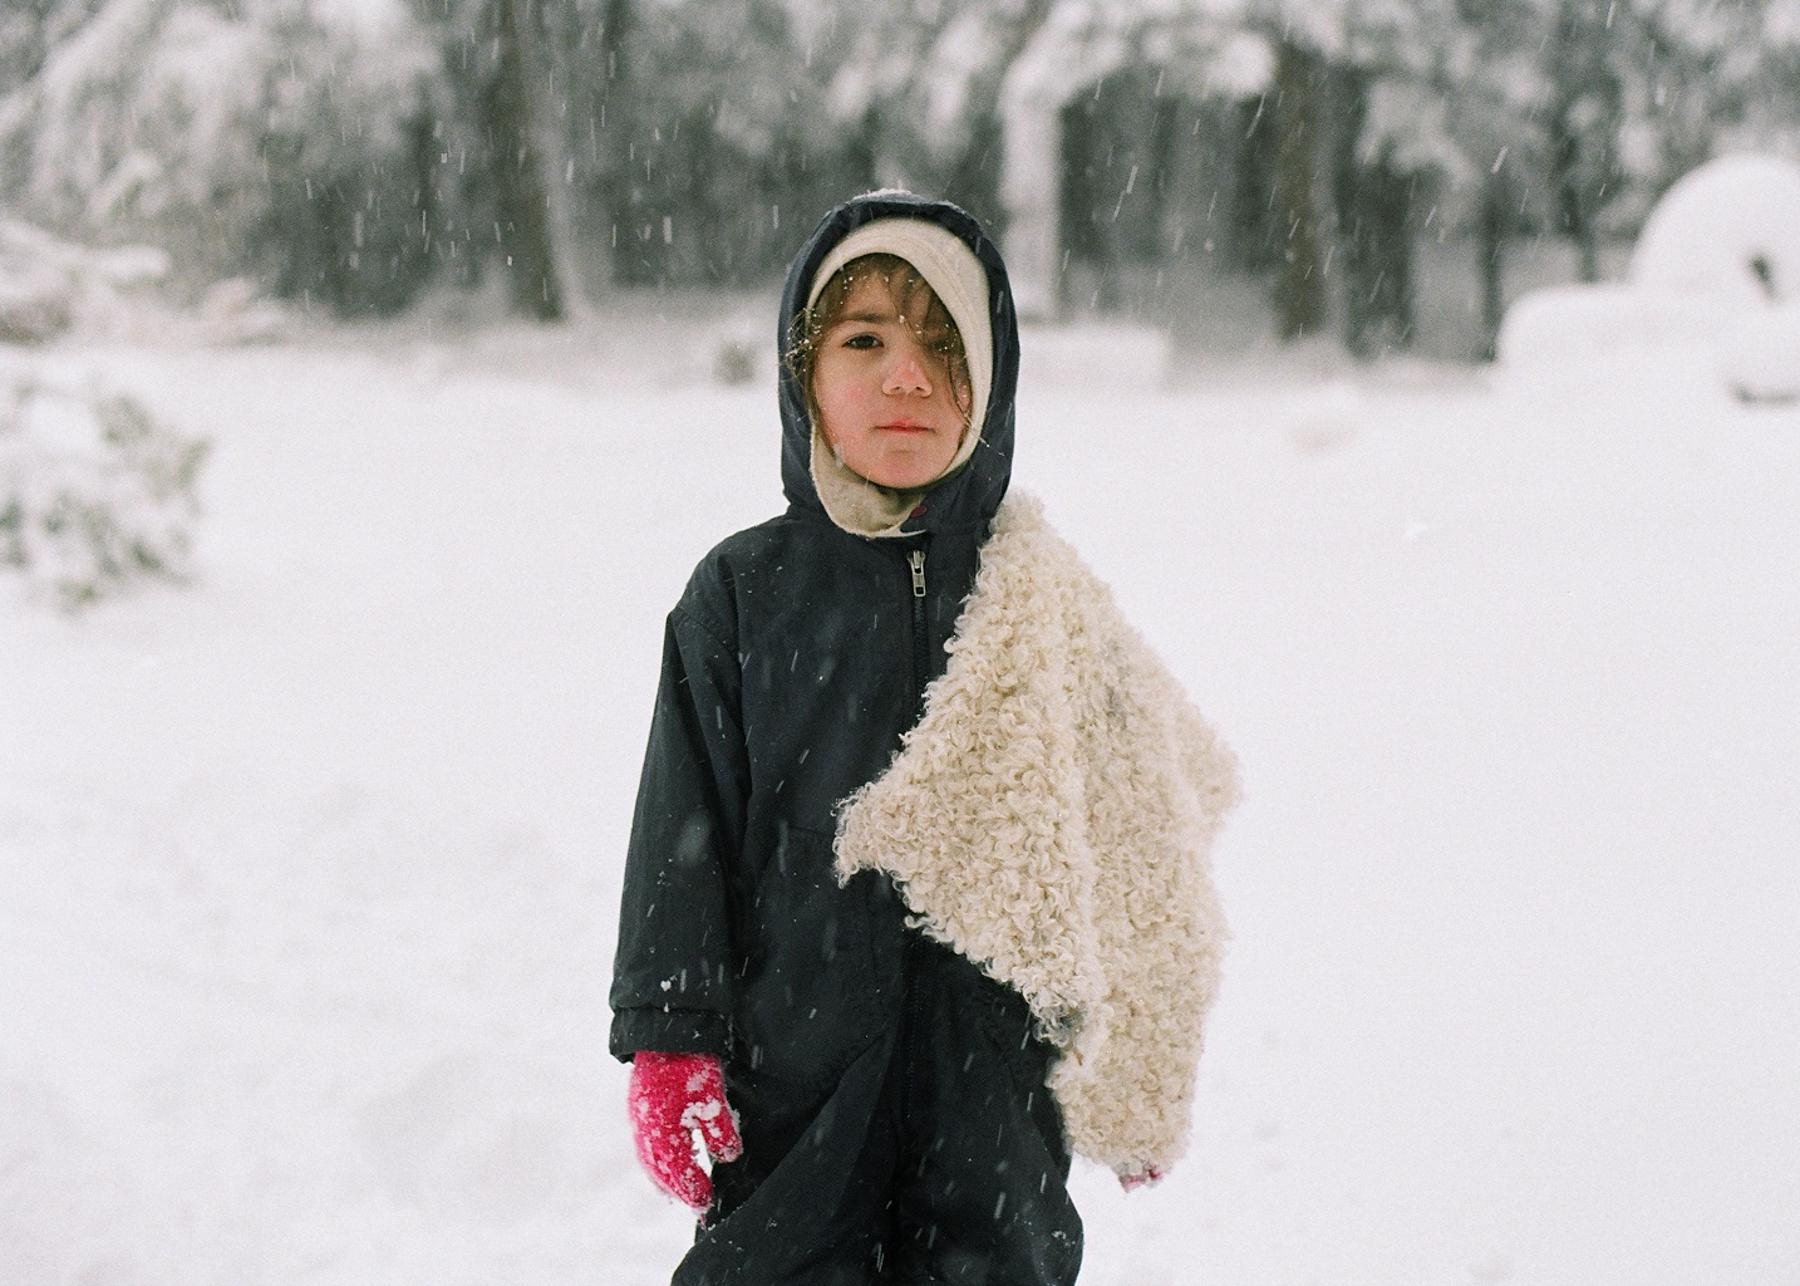 Oscar + his lambskin